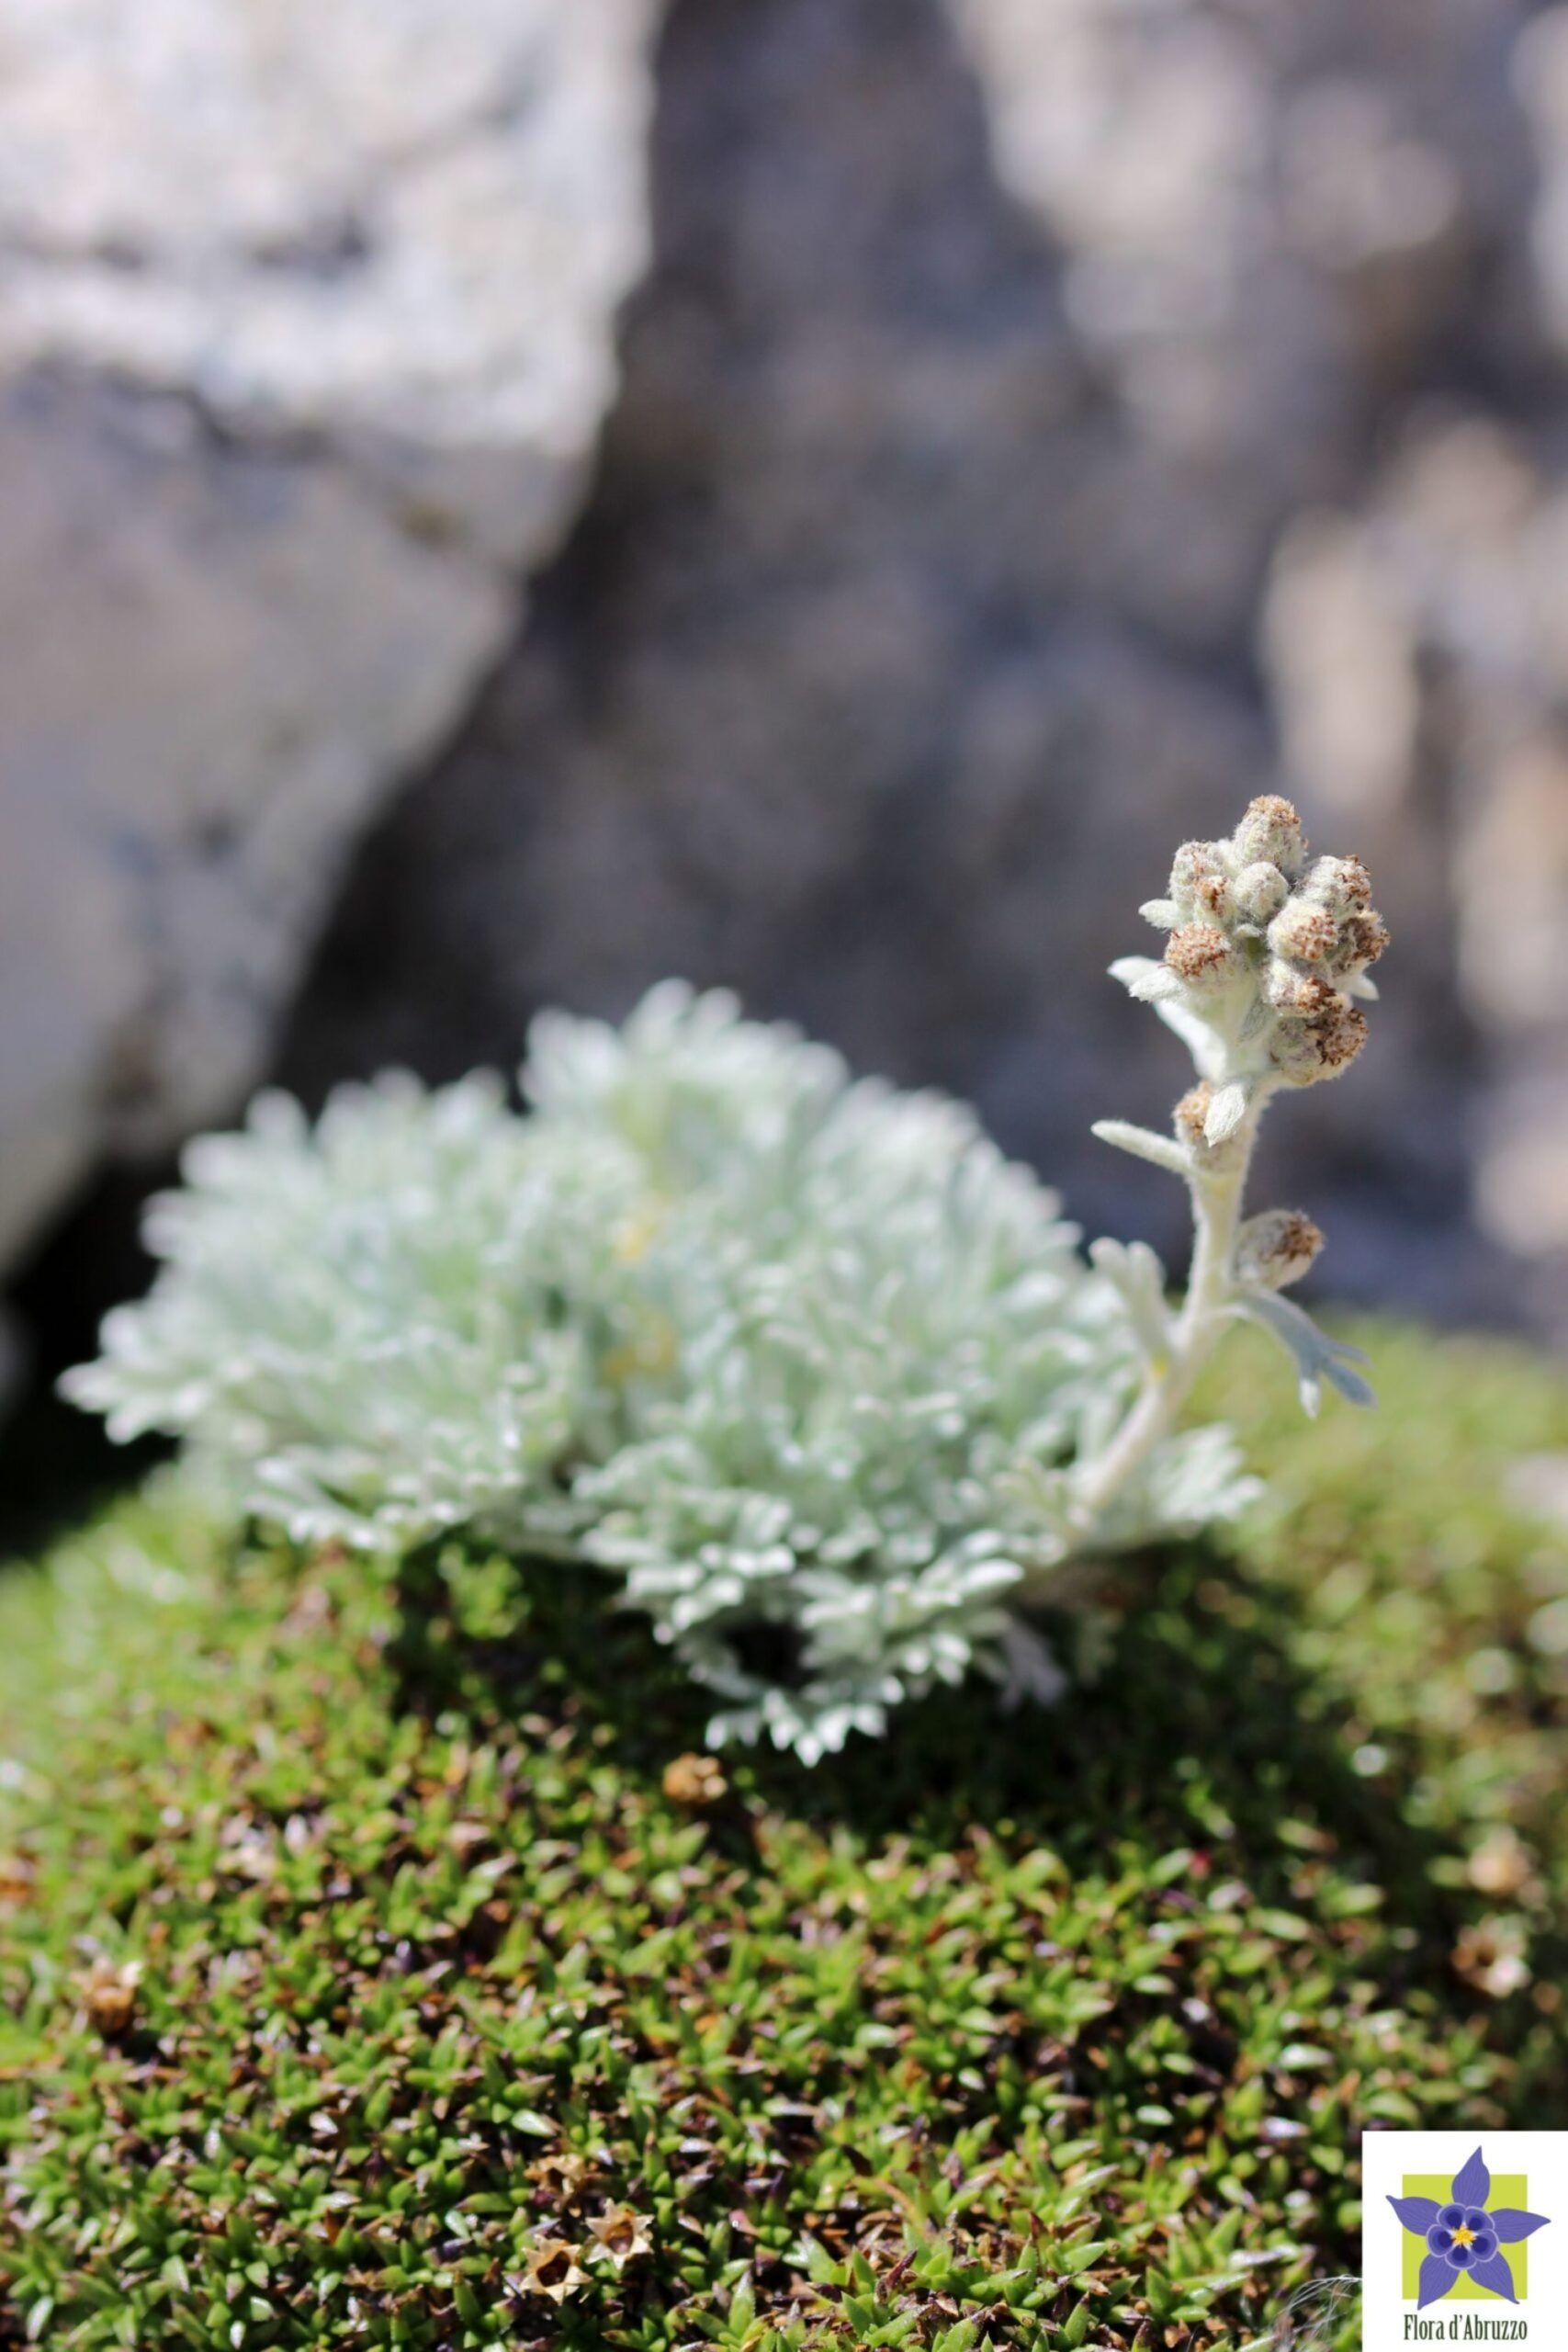 Flora d'Abruzzo